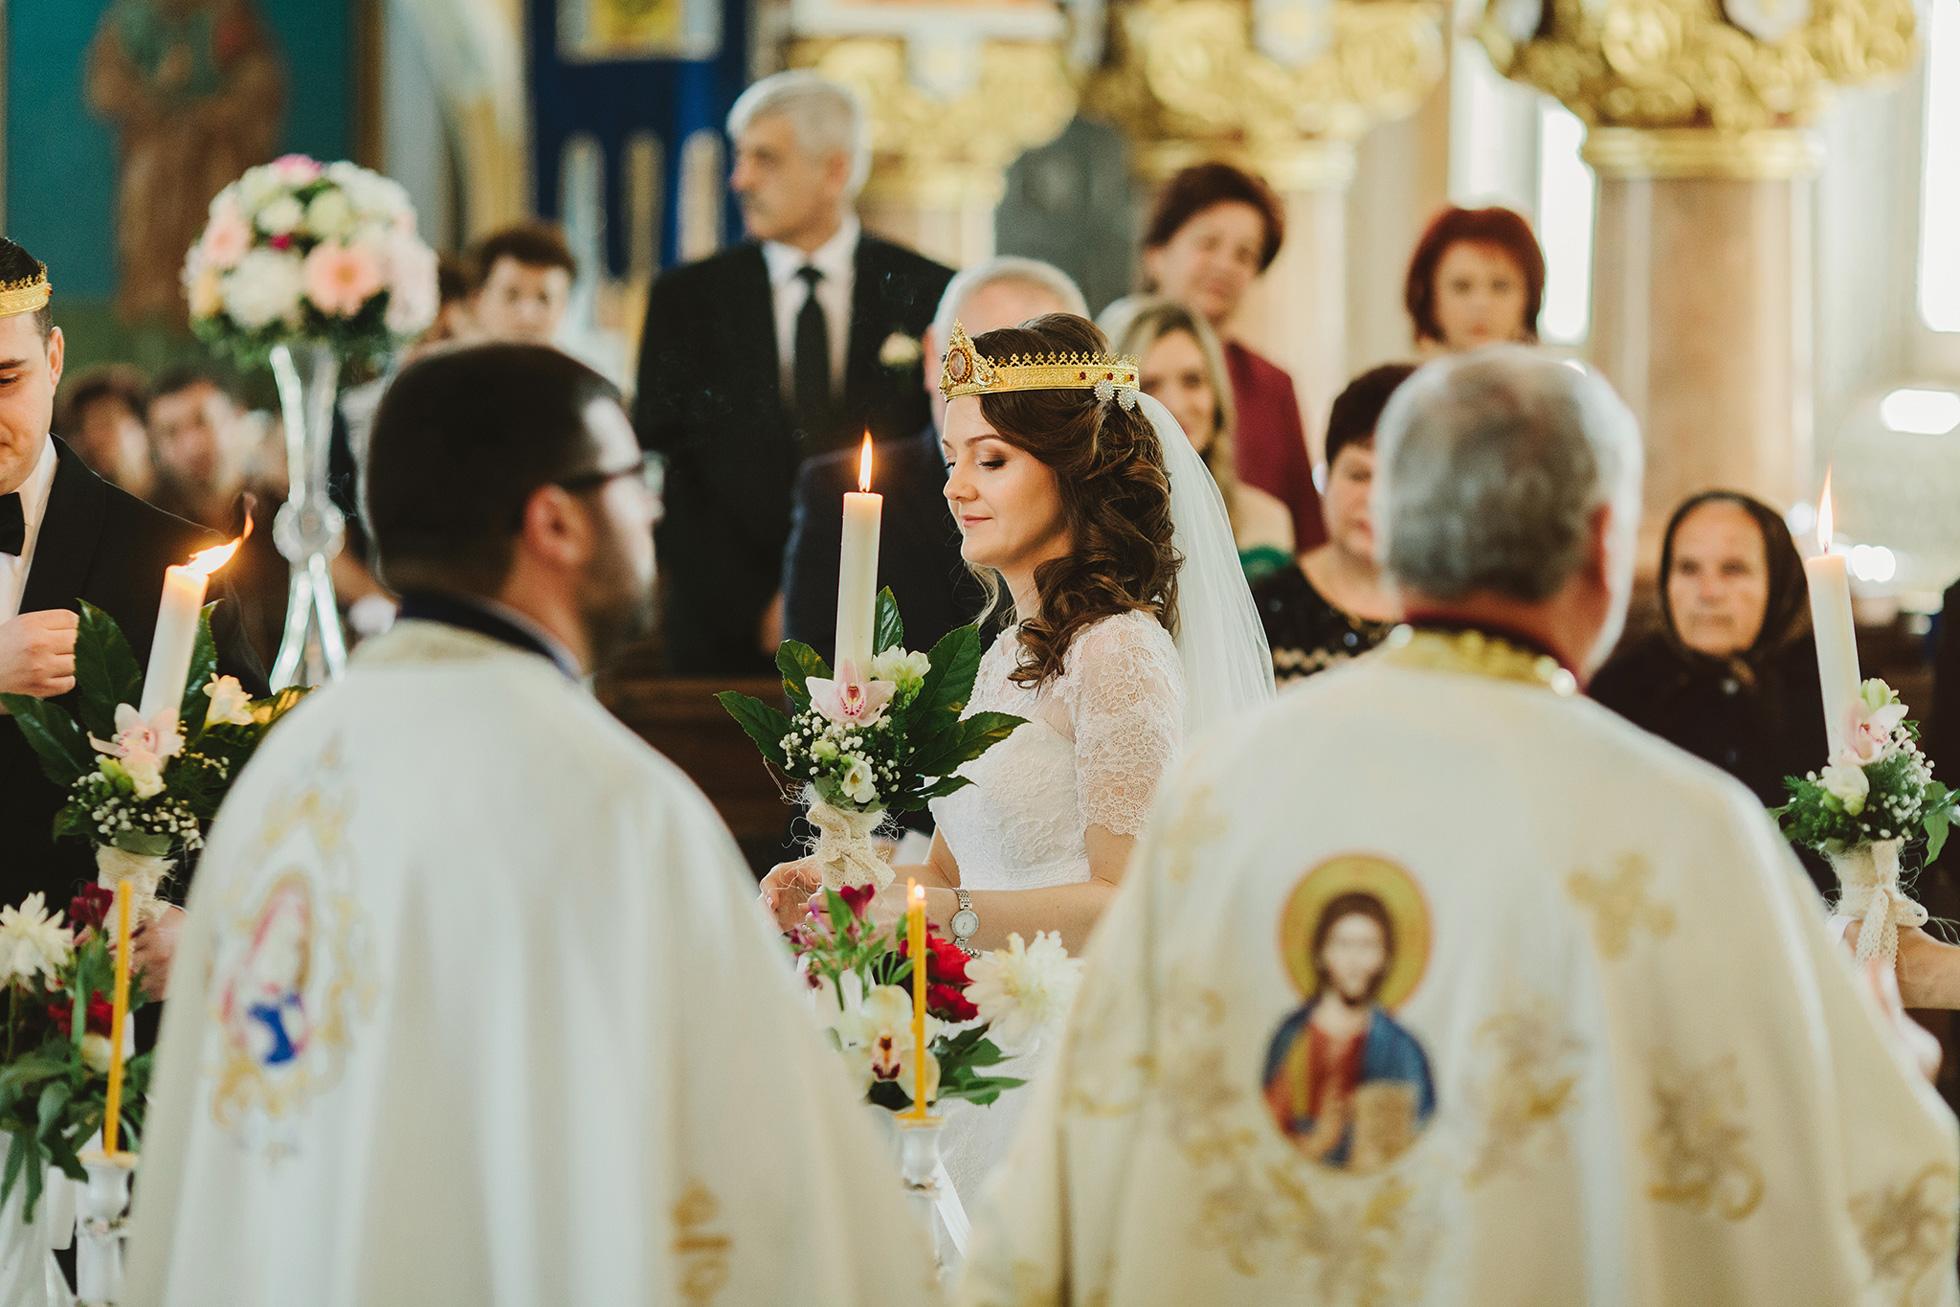 Liana-+-Florin-{wedding}-096